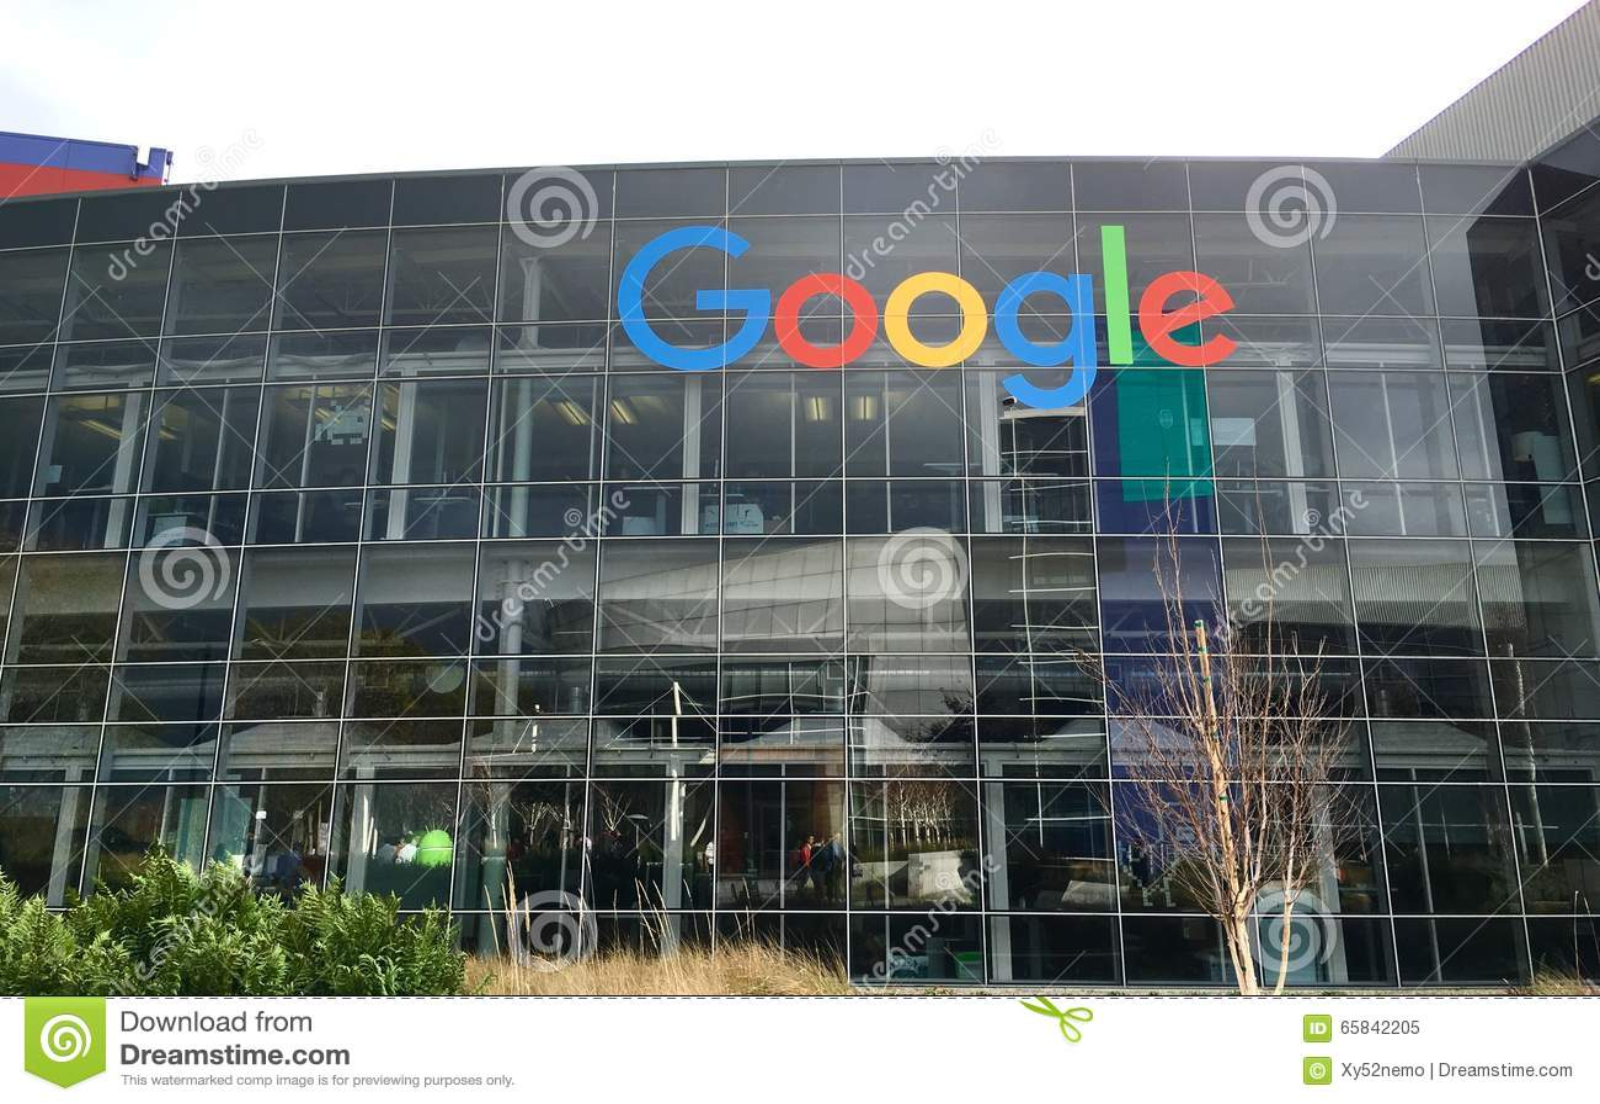 Google logo editorial image image 65842205 for Google house builder